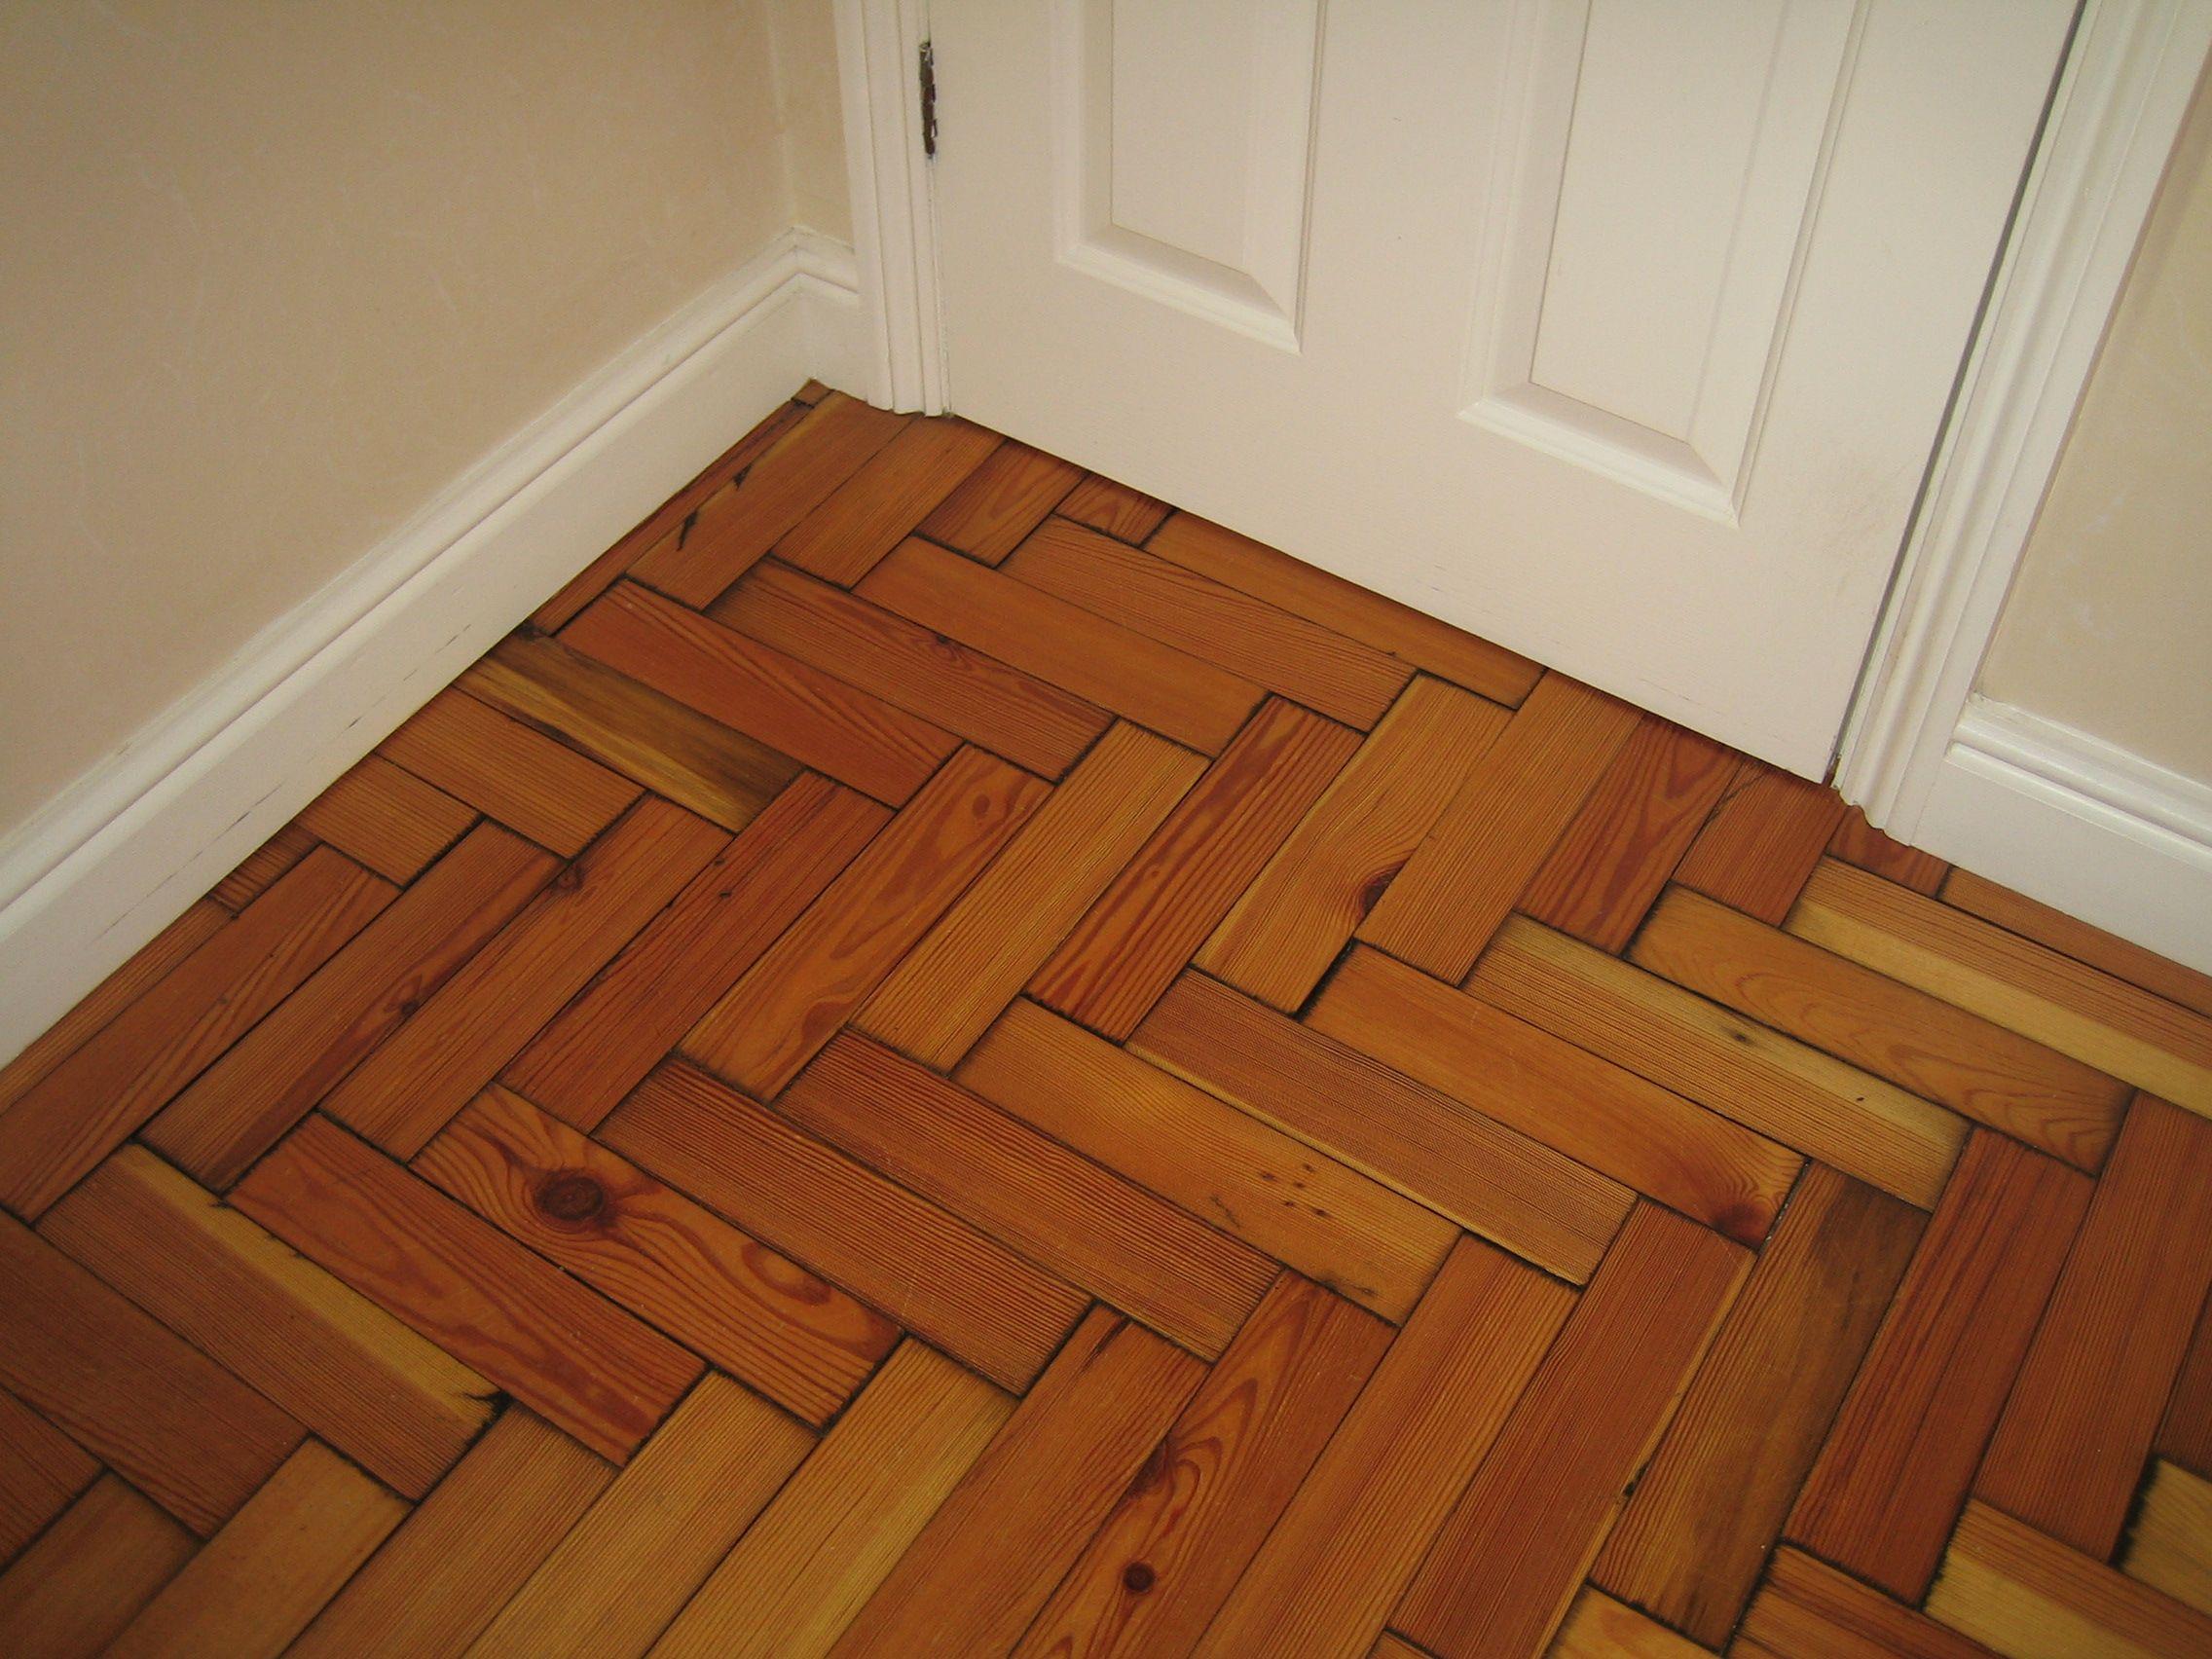 Hardwood Floor Ideas House Flooring Flooring Cheap Hardwood Floors